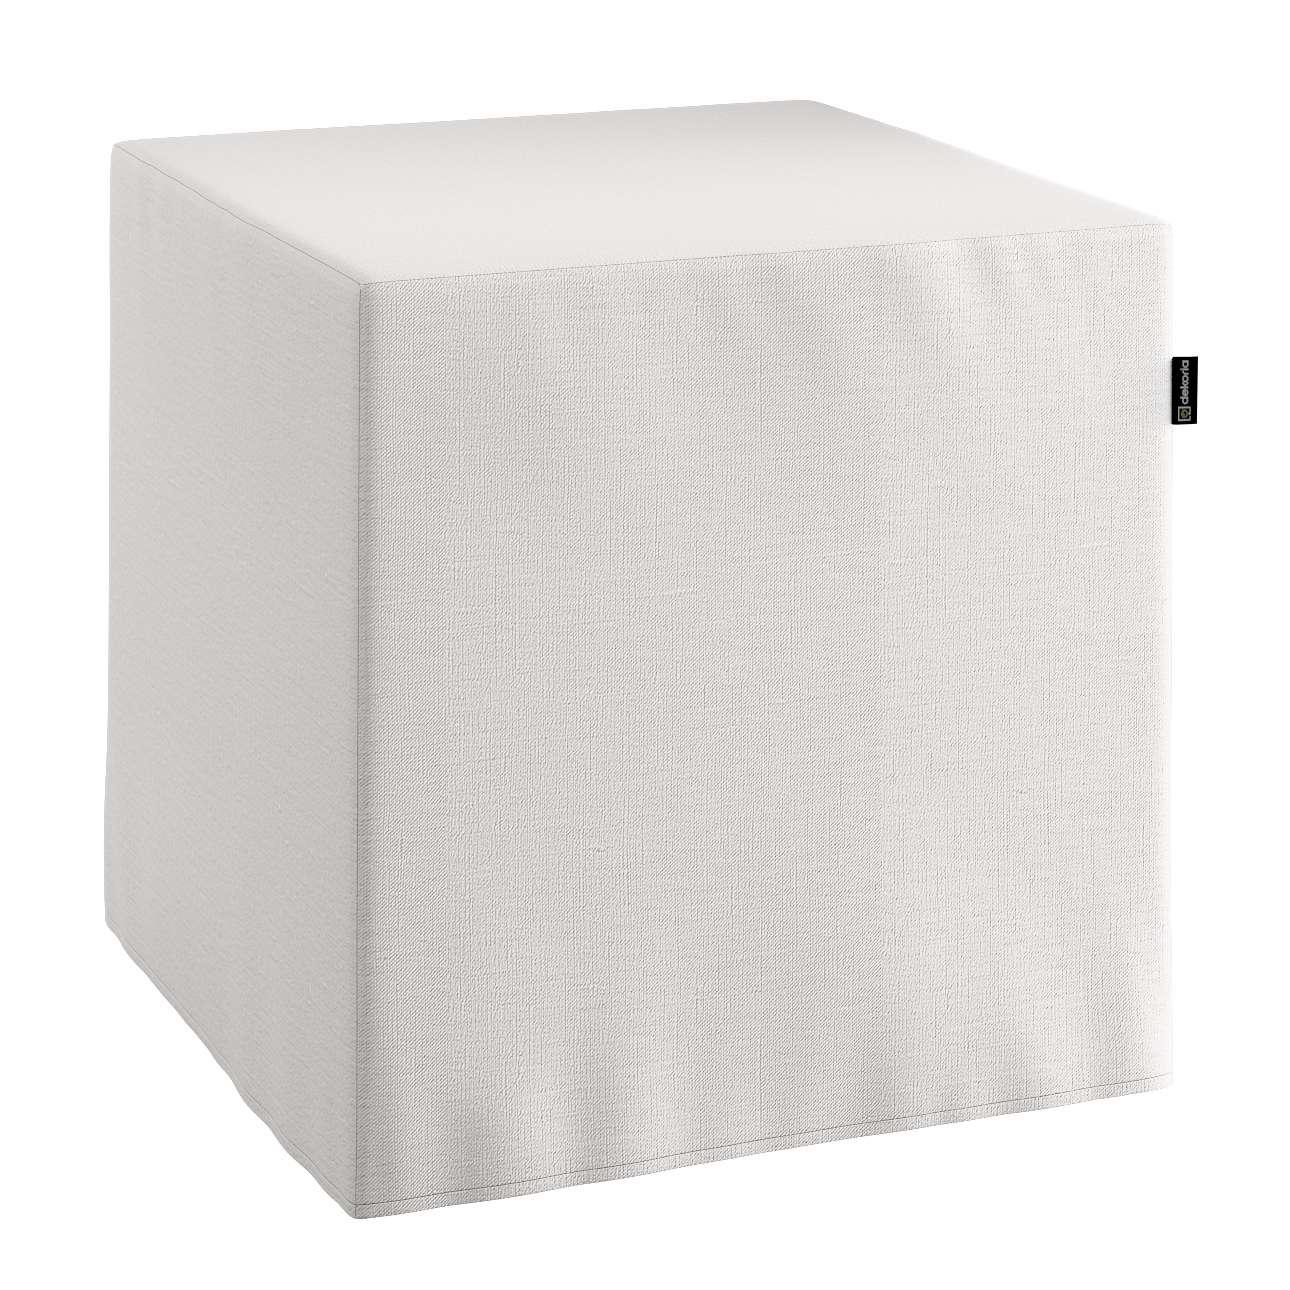 Pufa kostka w kolekcji Linen, tkanina: 392-04